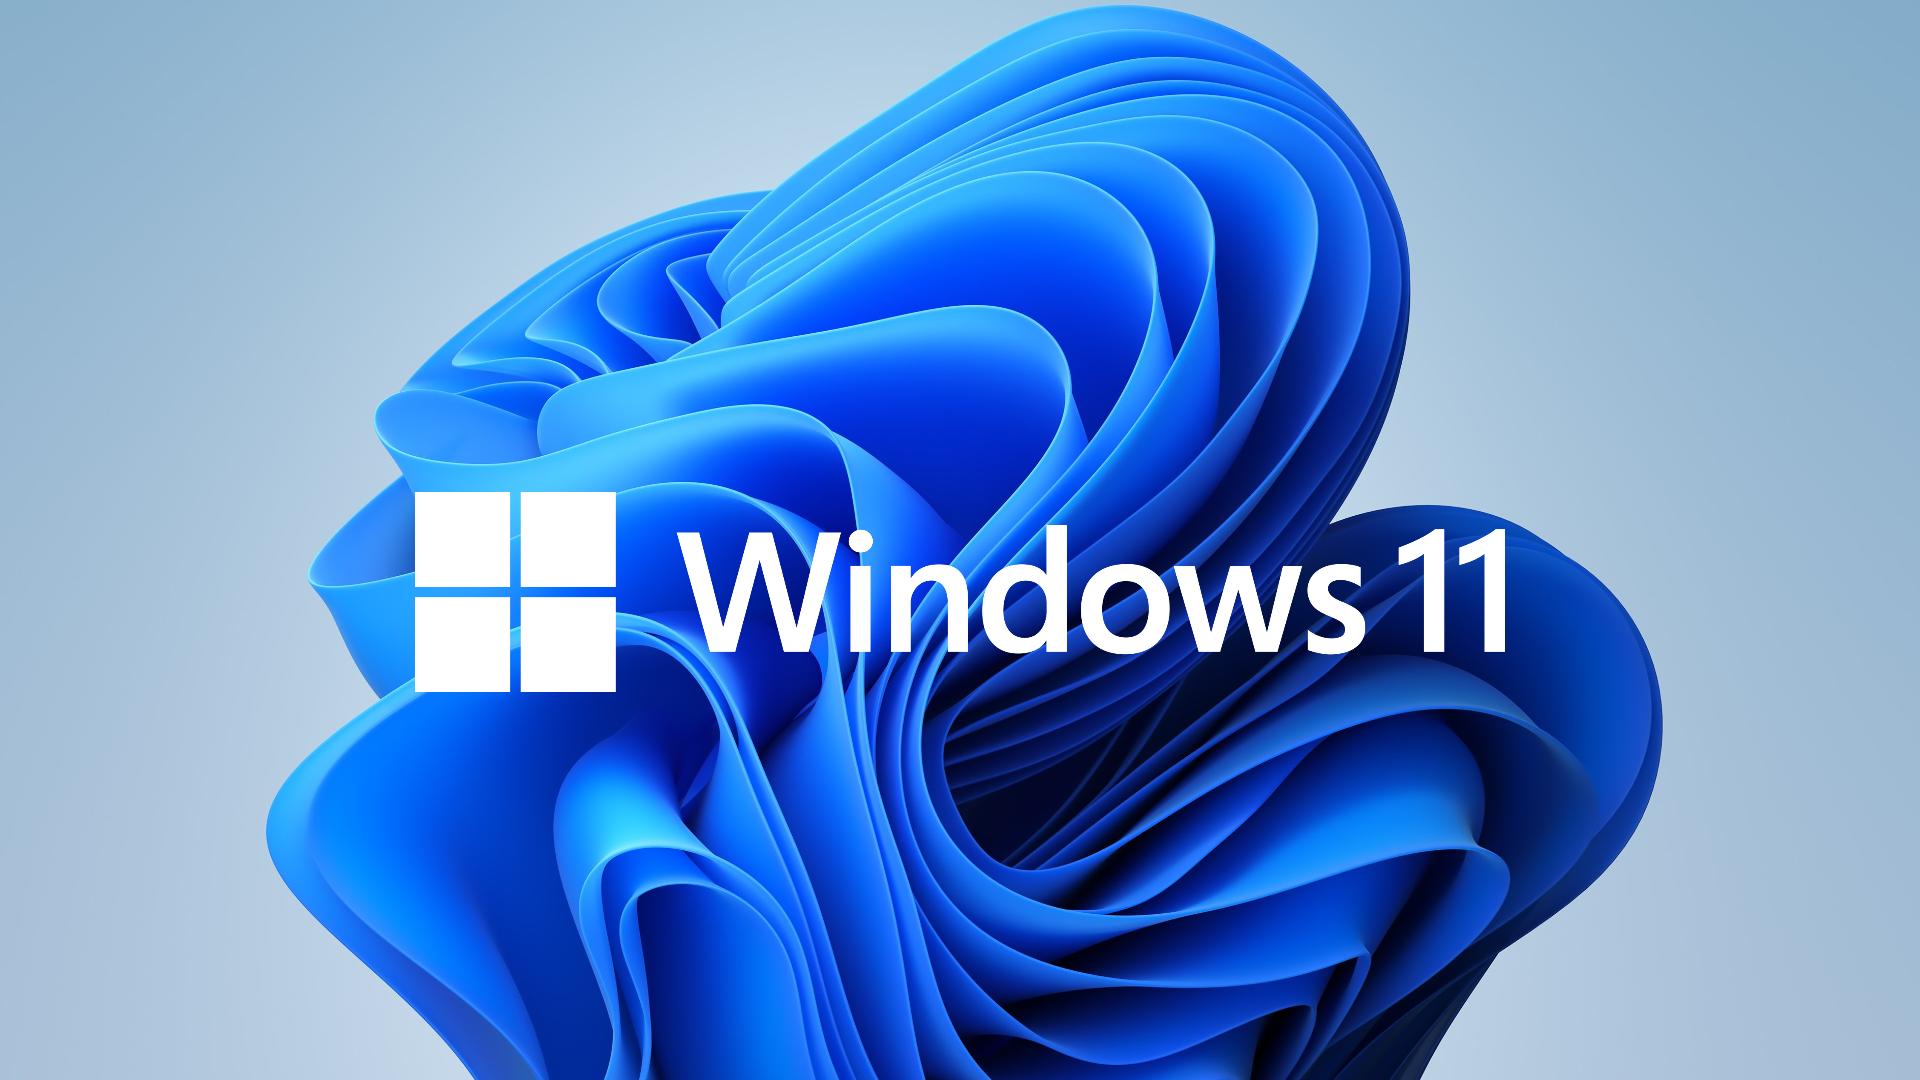 Windows 11 Logo